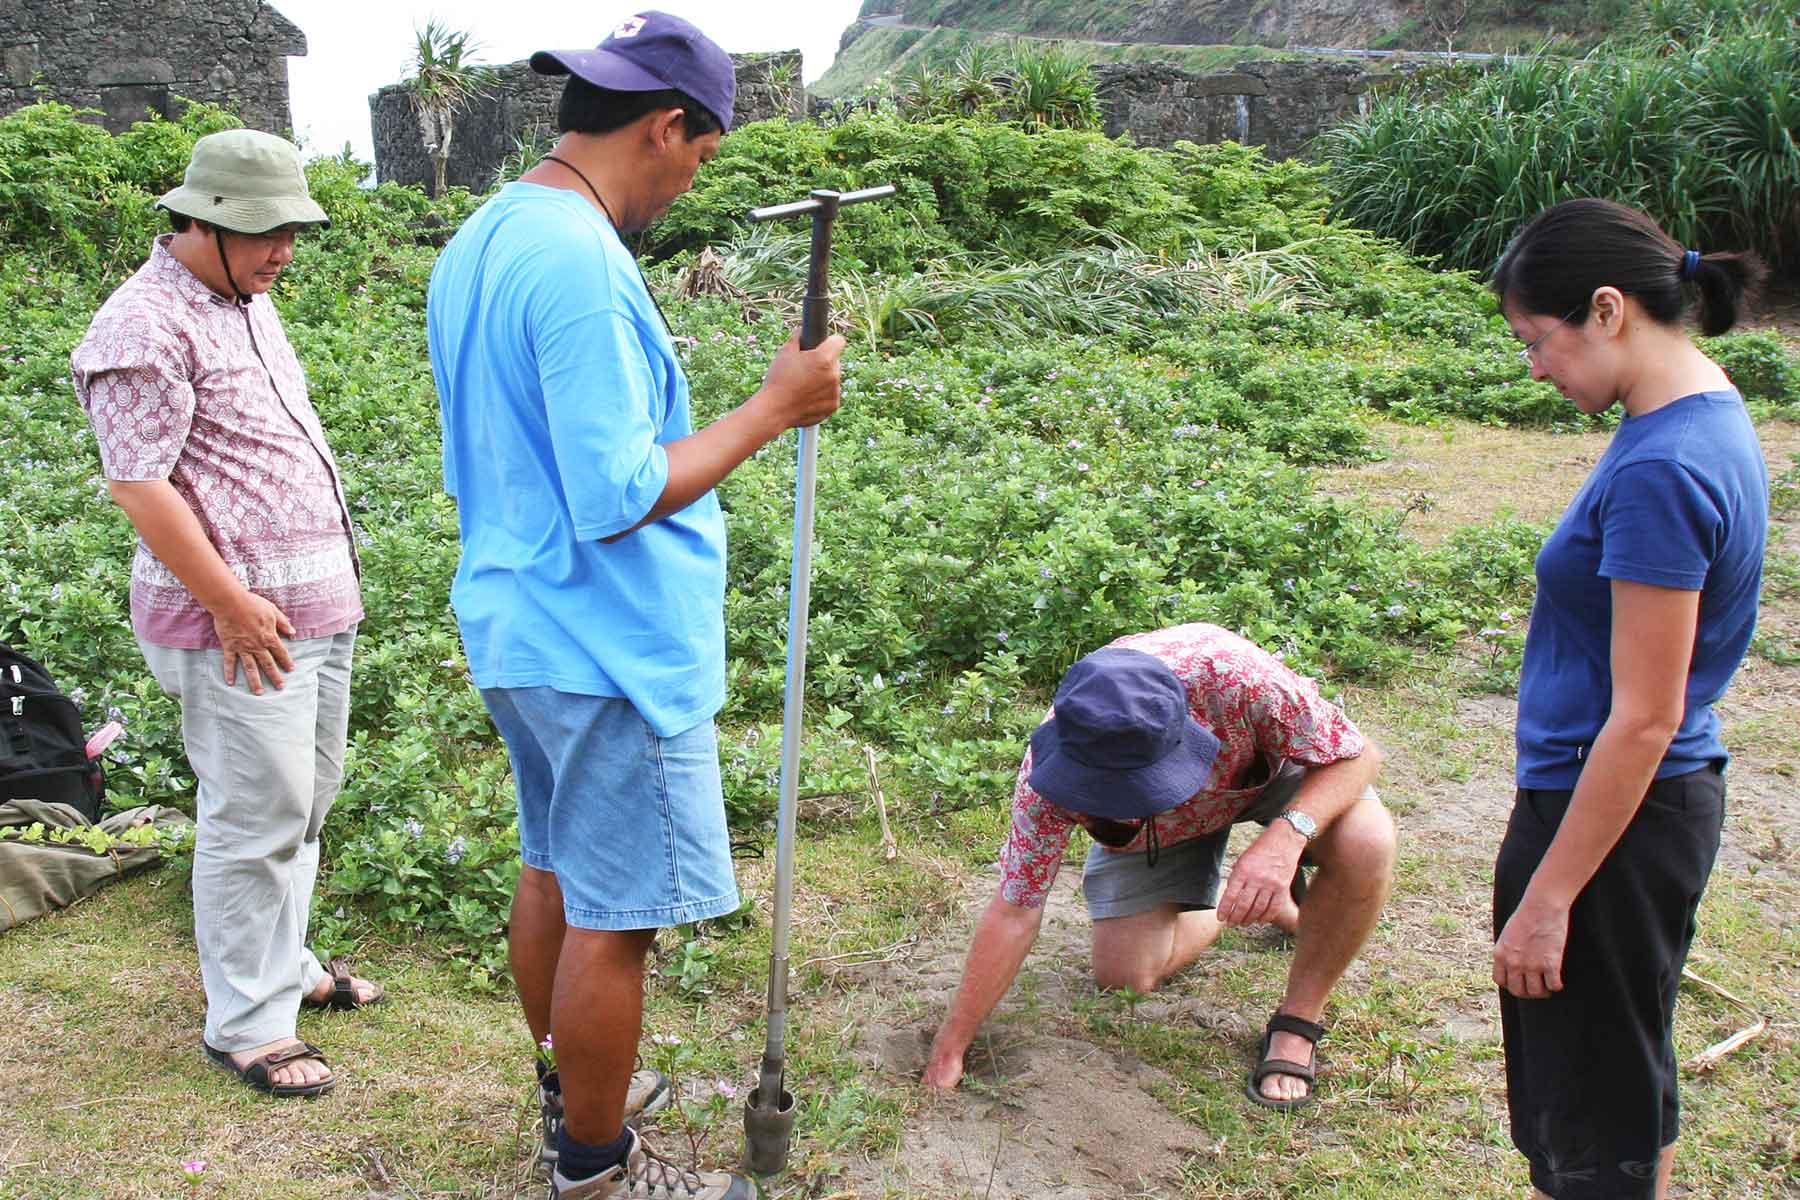 Batanes Islands Photo Journal - The Philippines - Archaeological Survey Team - Steven Andrew Martin - Austronesian Studies